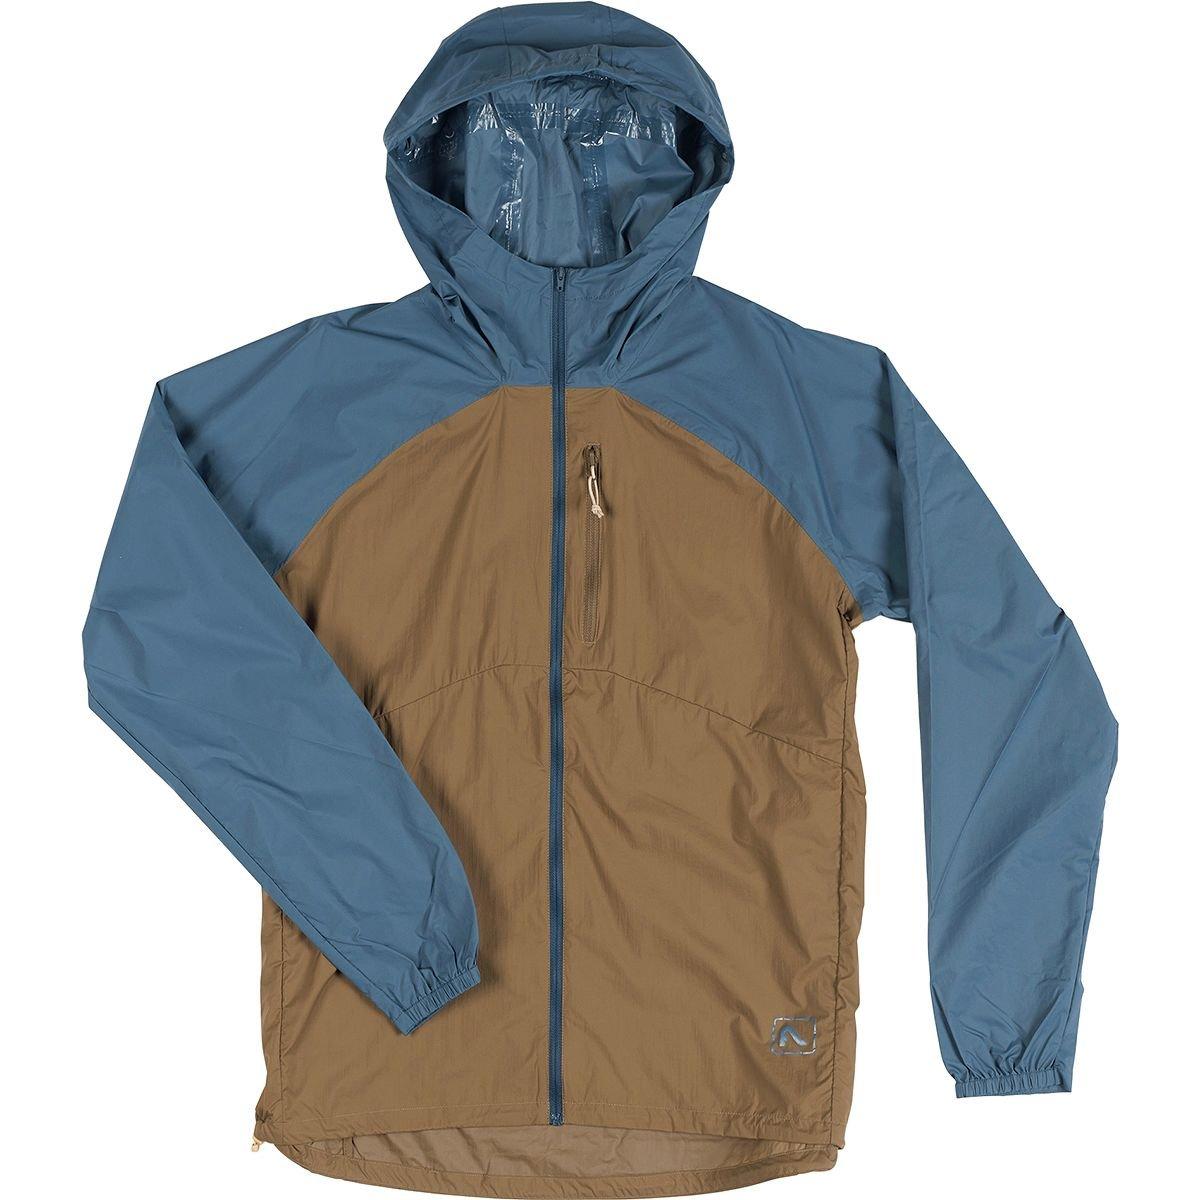 Flylow Rainbreaker Jacket – Men 's B07BWTS7F3  Loam Twilight M